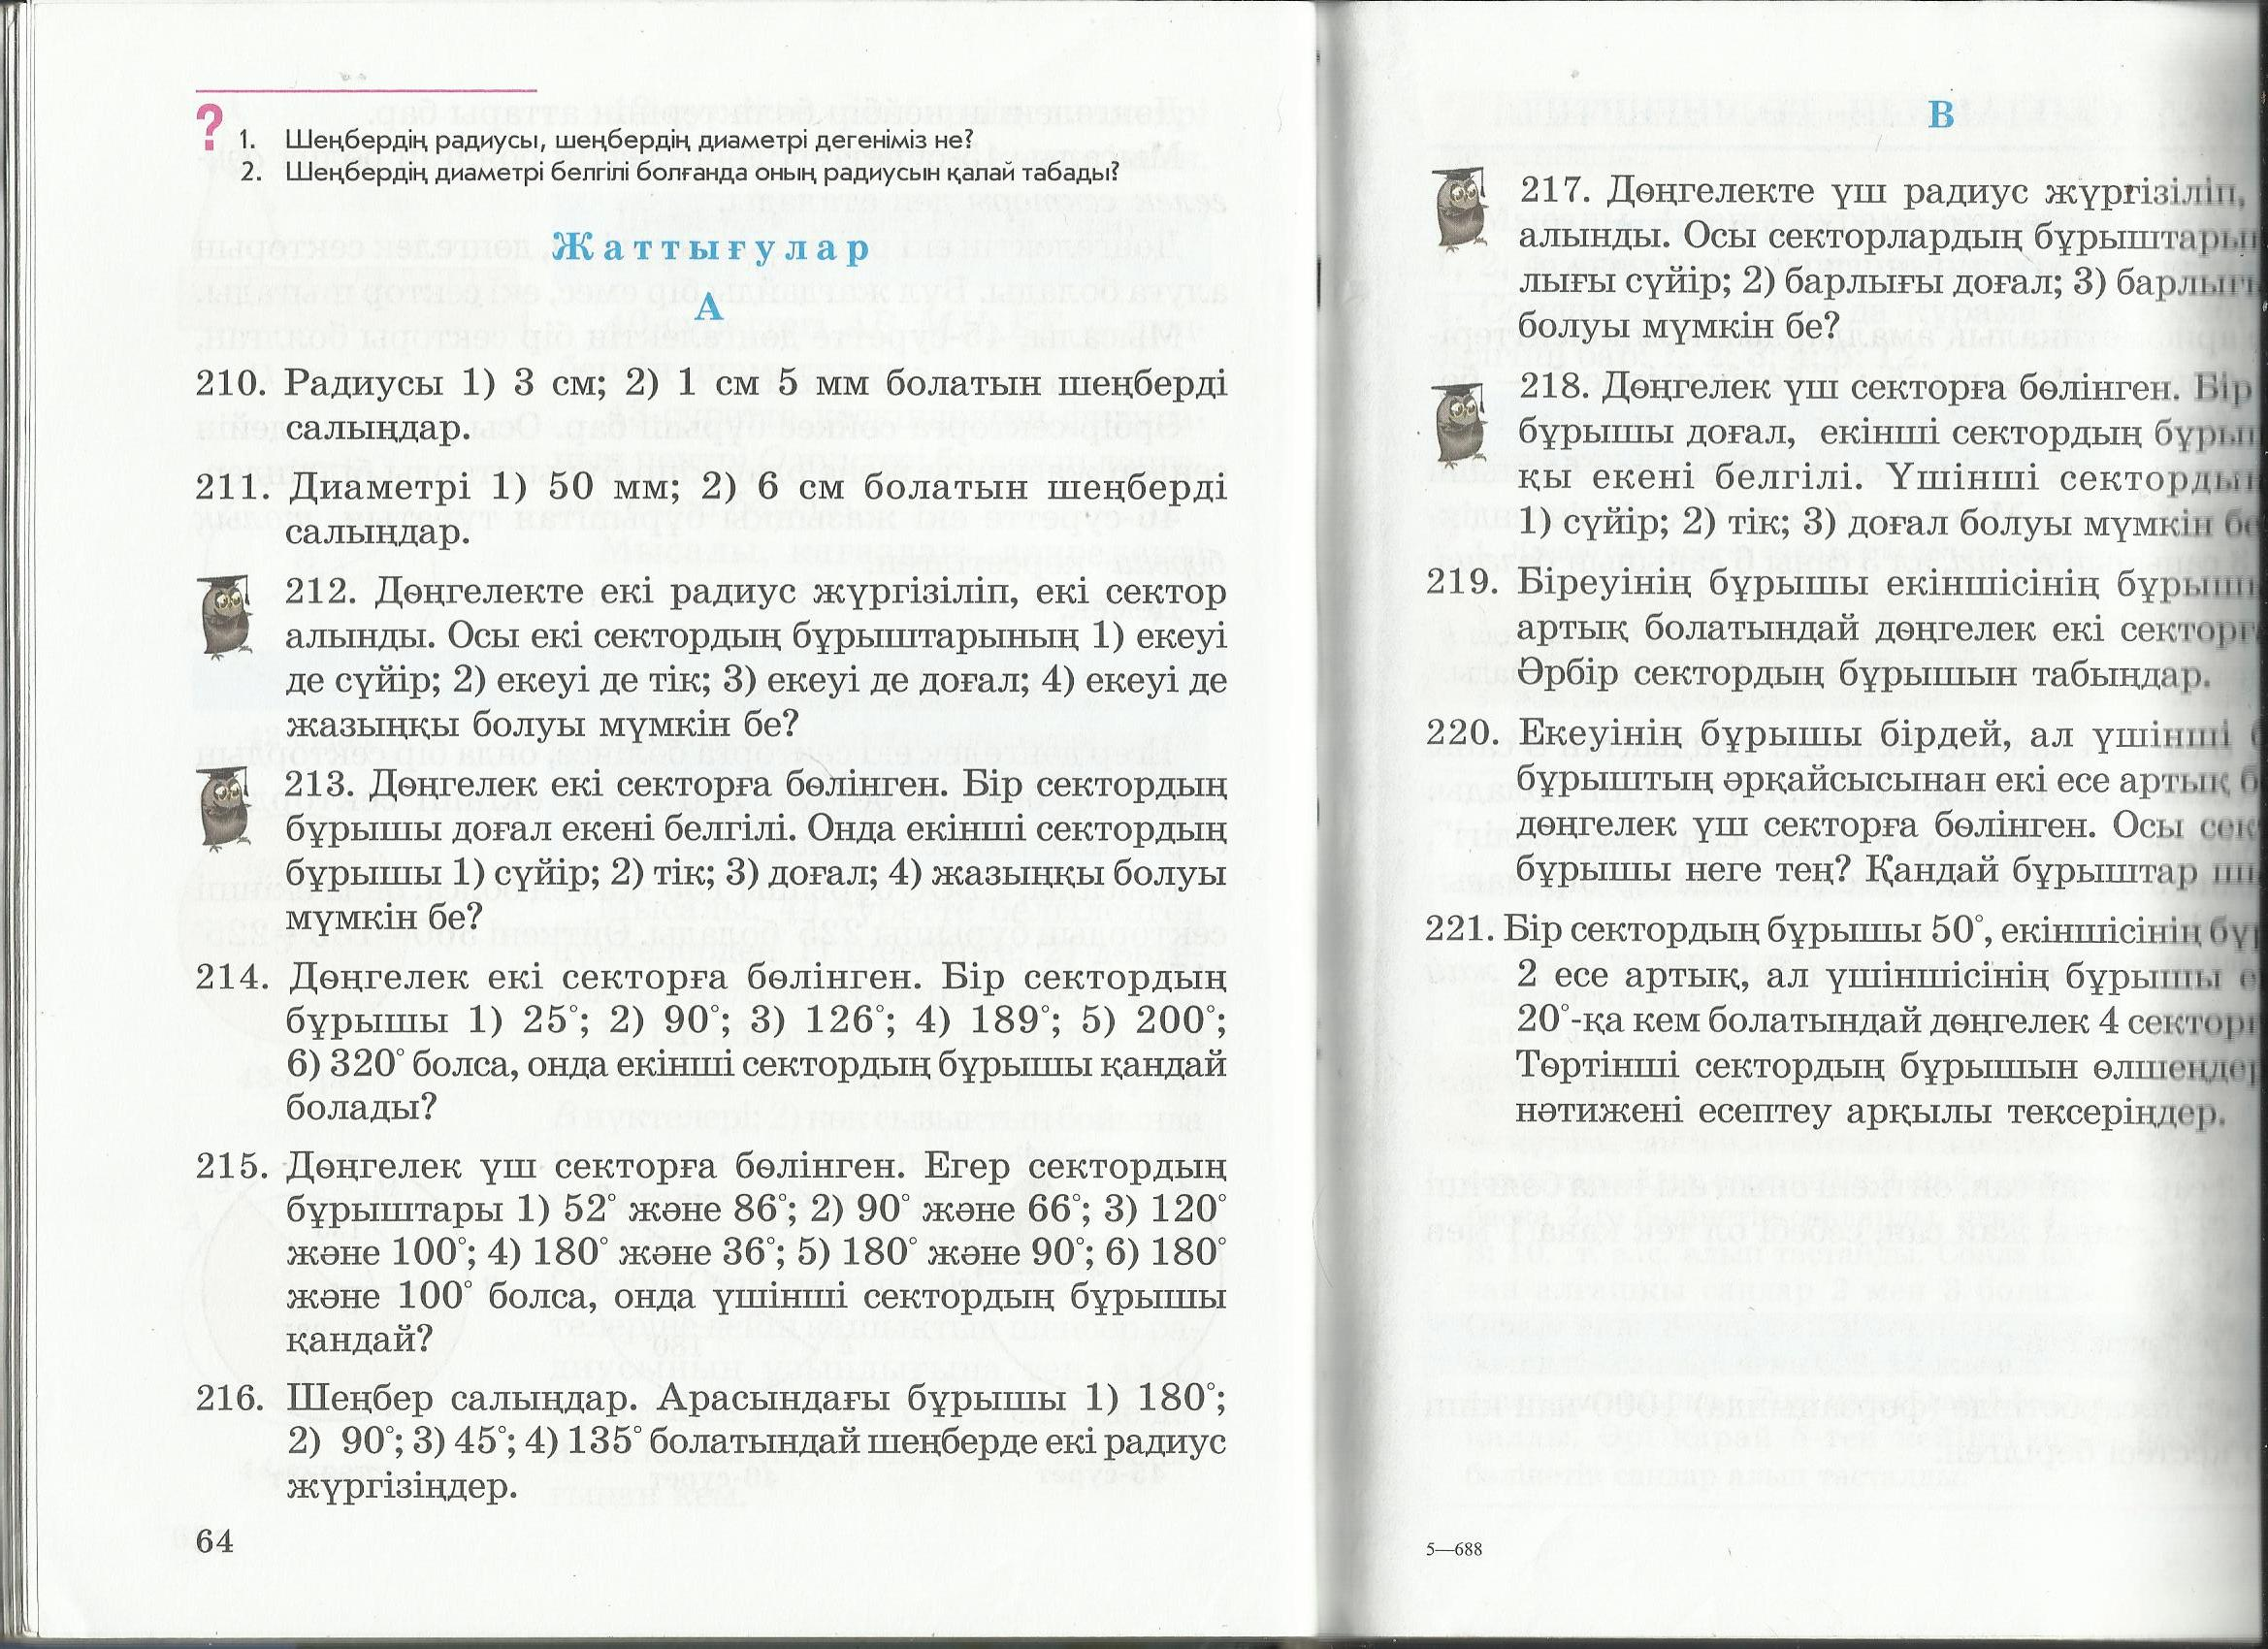 C:\Documents and Settings\Admin\Рабочий стол\Новая папка (5)\Математика\Изображение 079.jpg